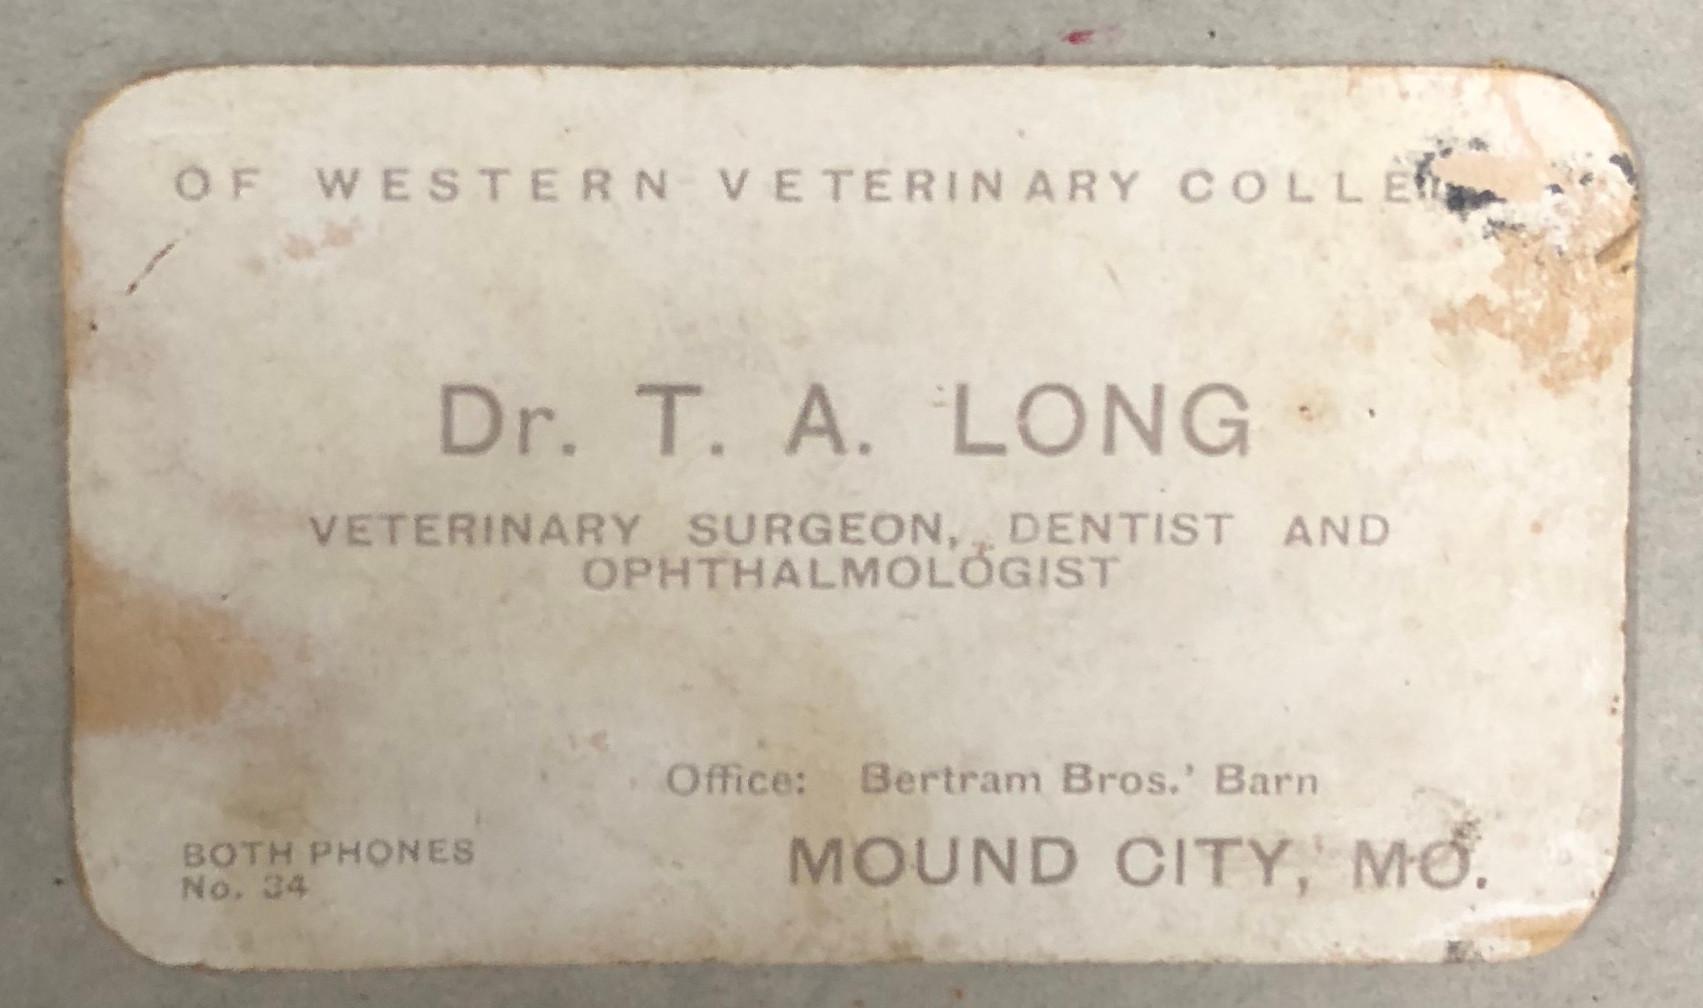 Thomas Long's Business Card